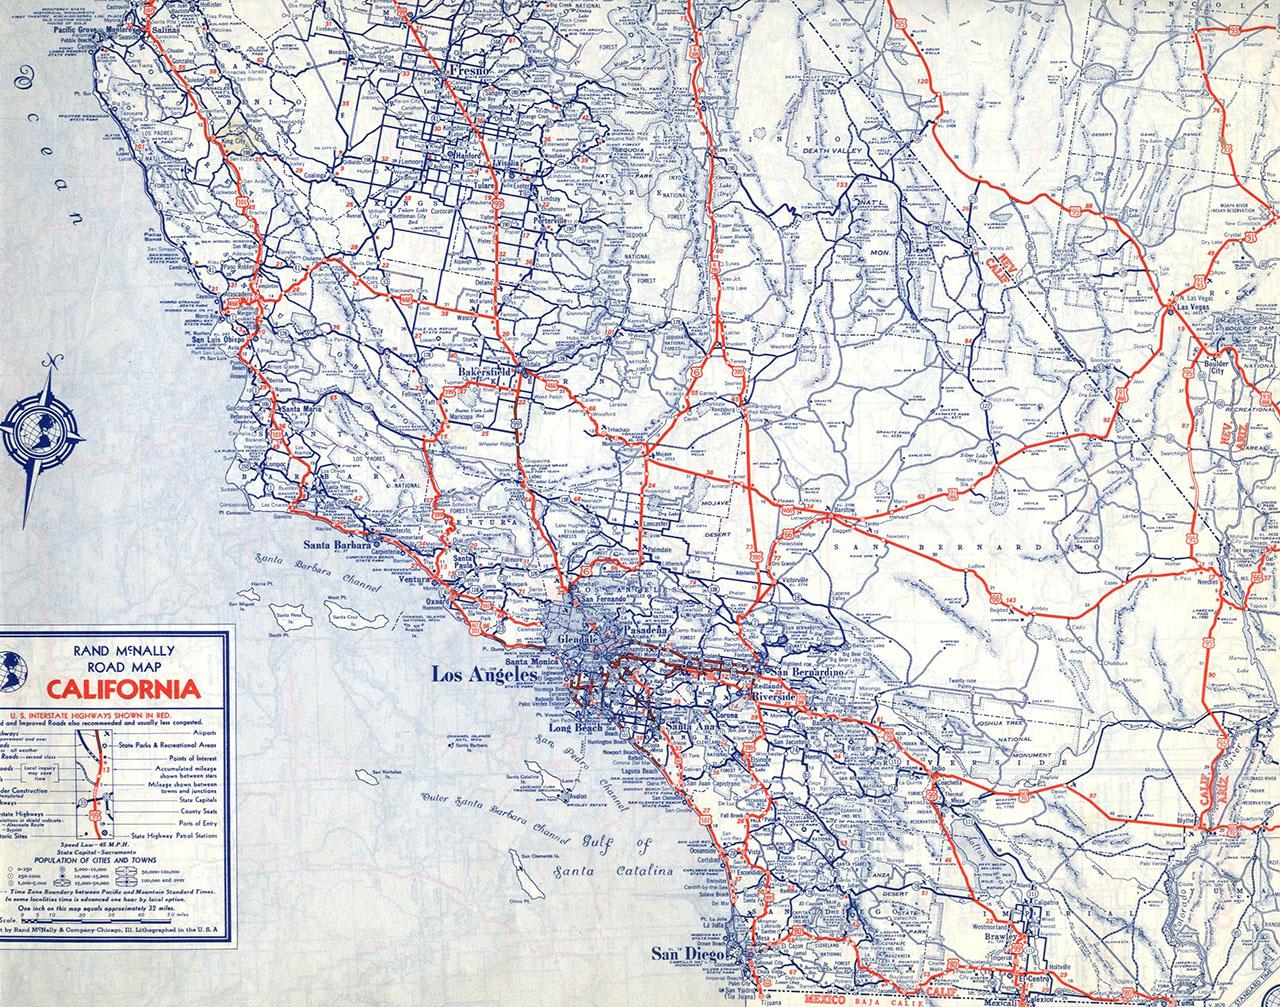 Road Map Of California And Nevada - Klipy - Road Map Of California And Nevada